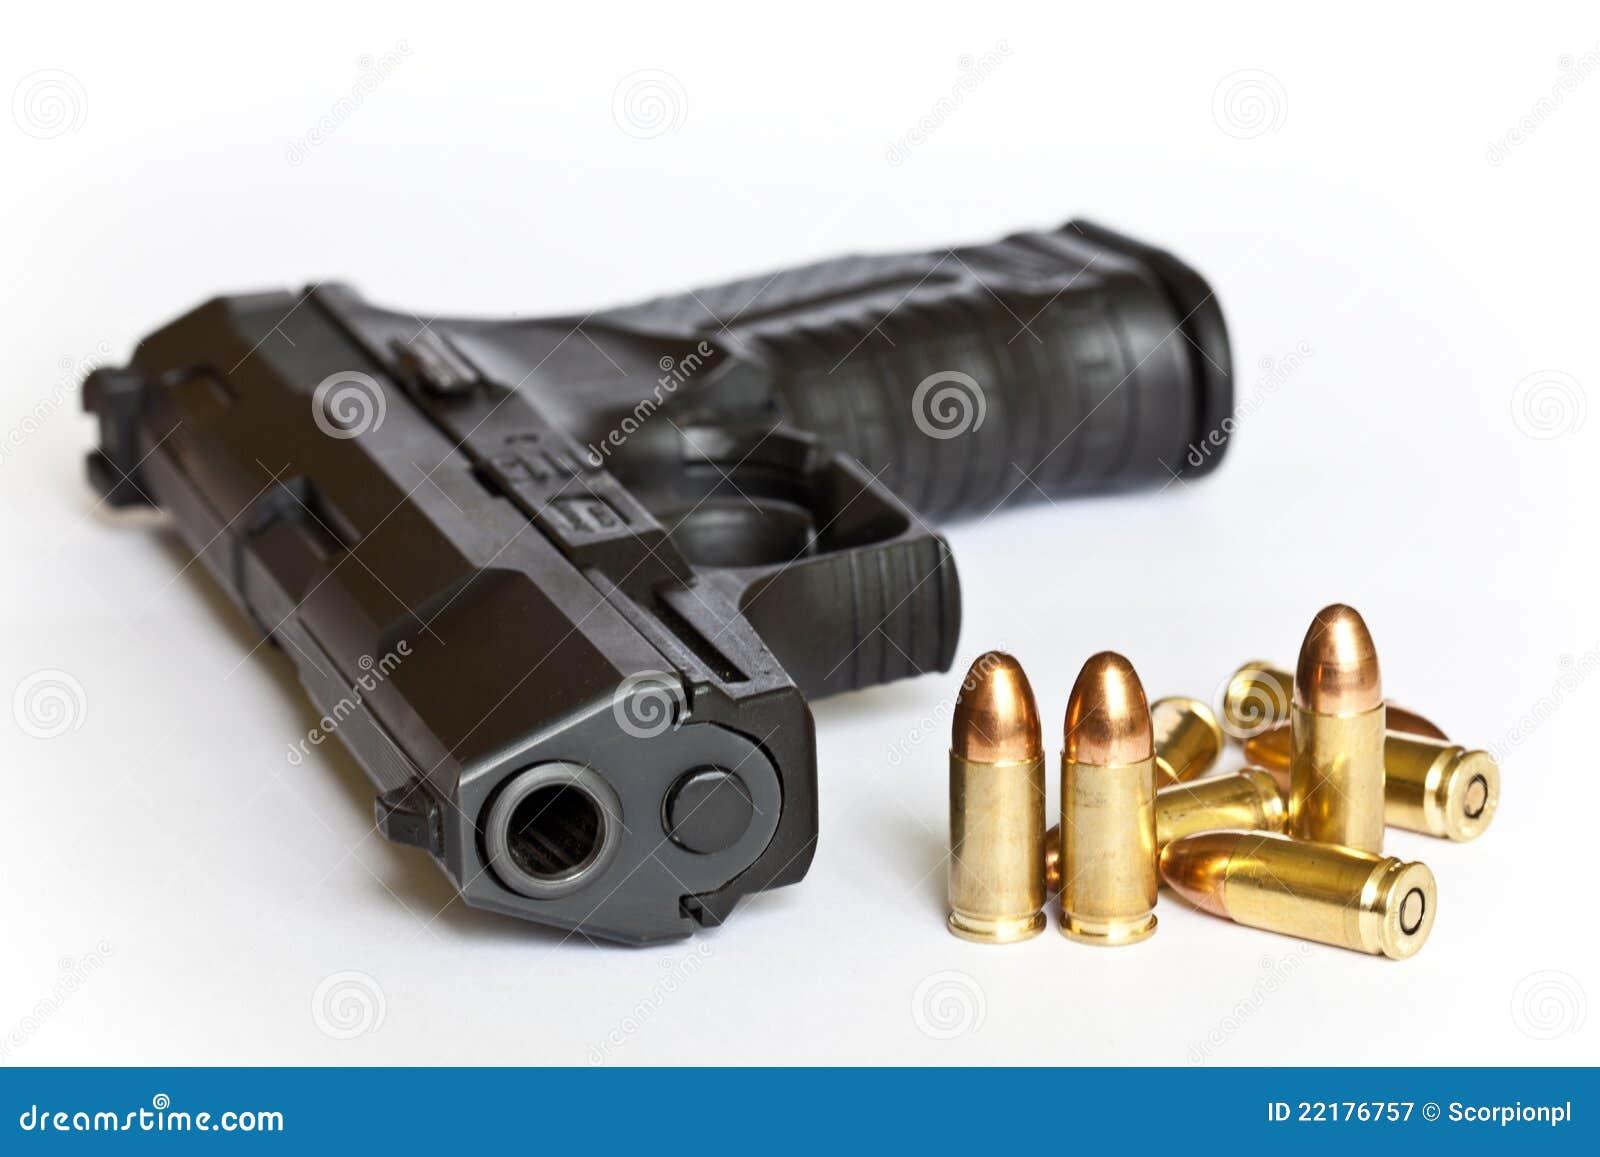 Guns And Bullets Royalty Free Stock Photography Image